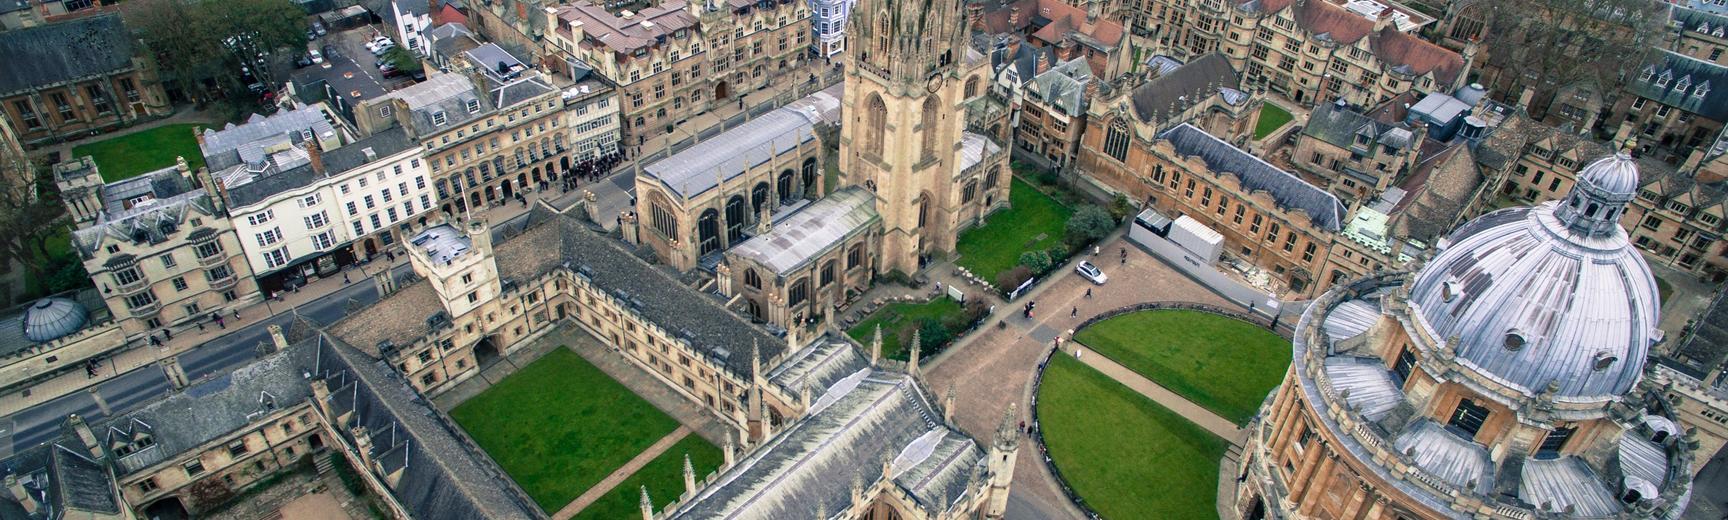 Aerial Oxford